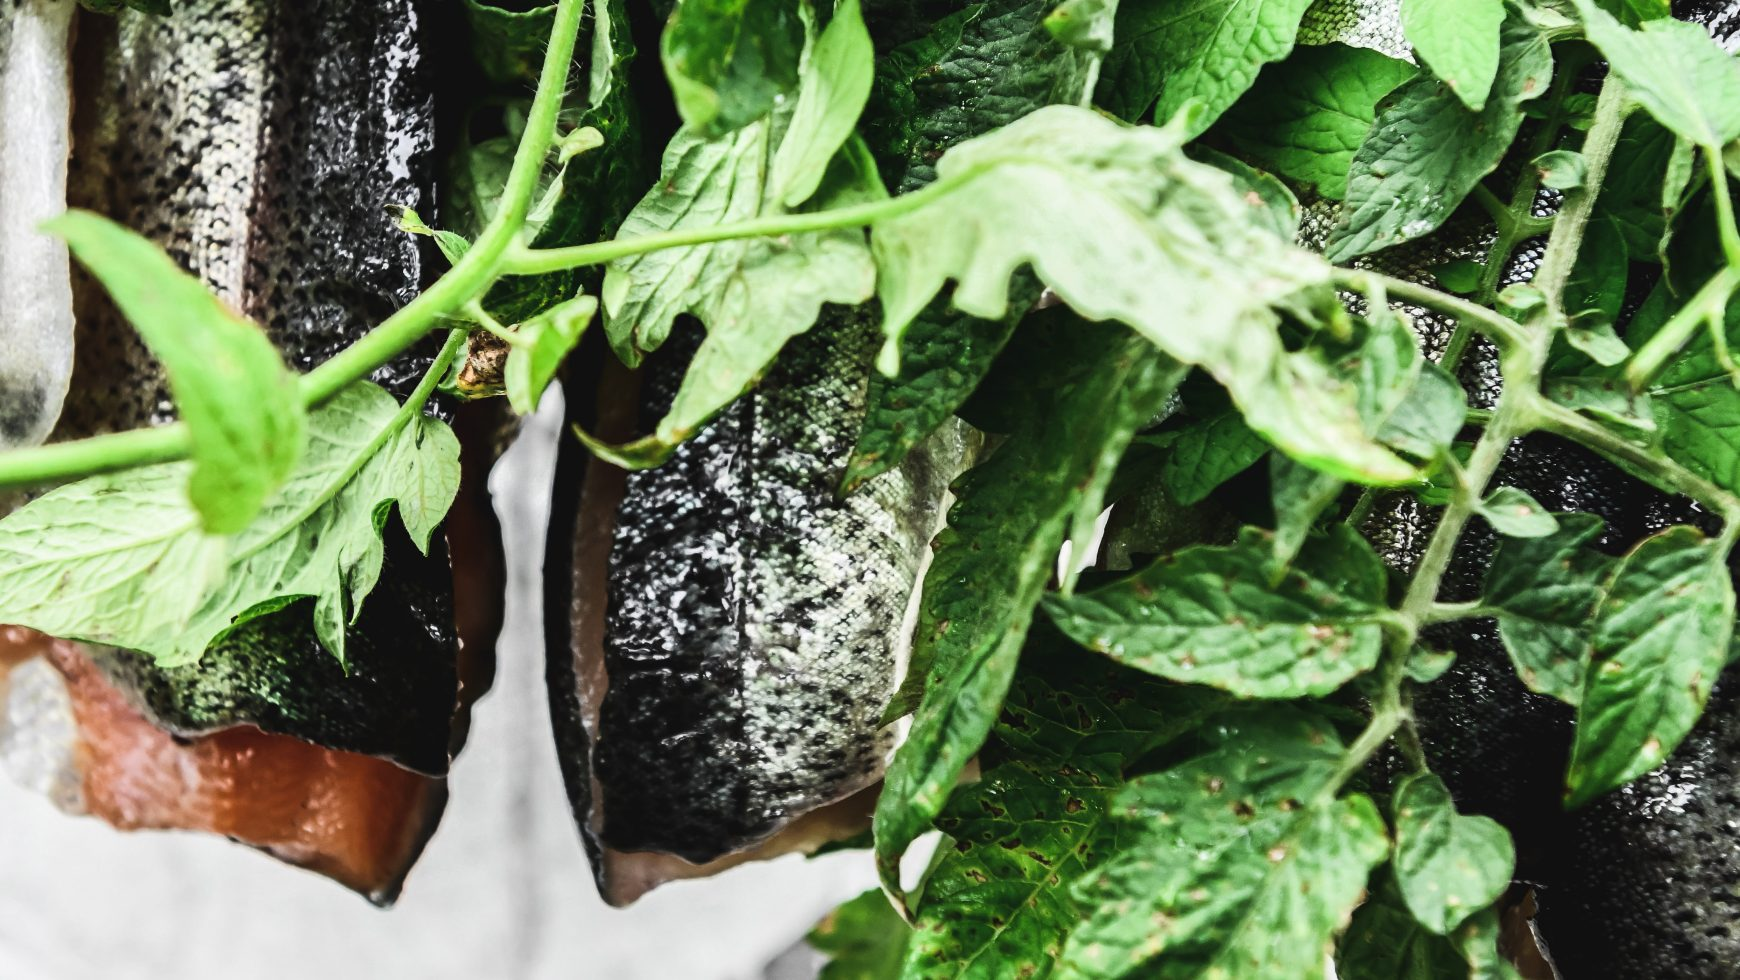 Summer Trout Recipes: Sous Vide, Confit, Sautéed, and Grilled